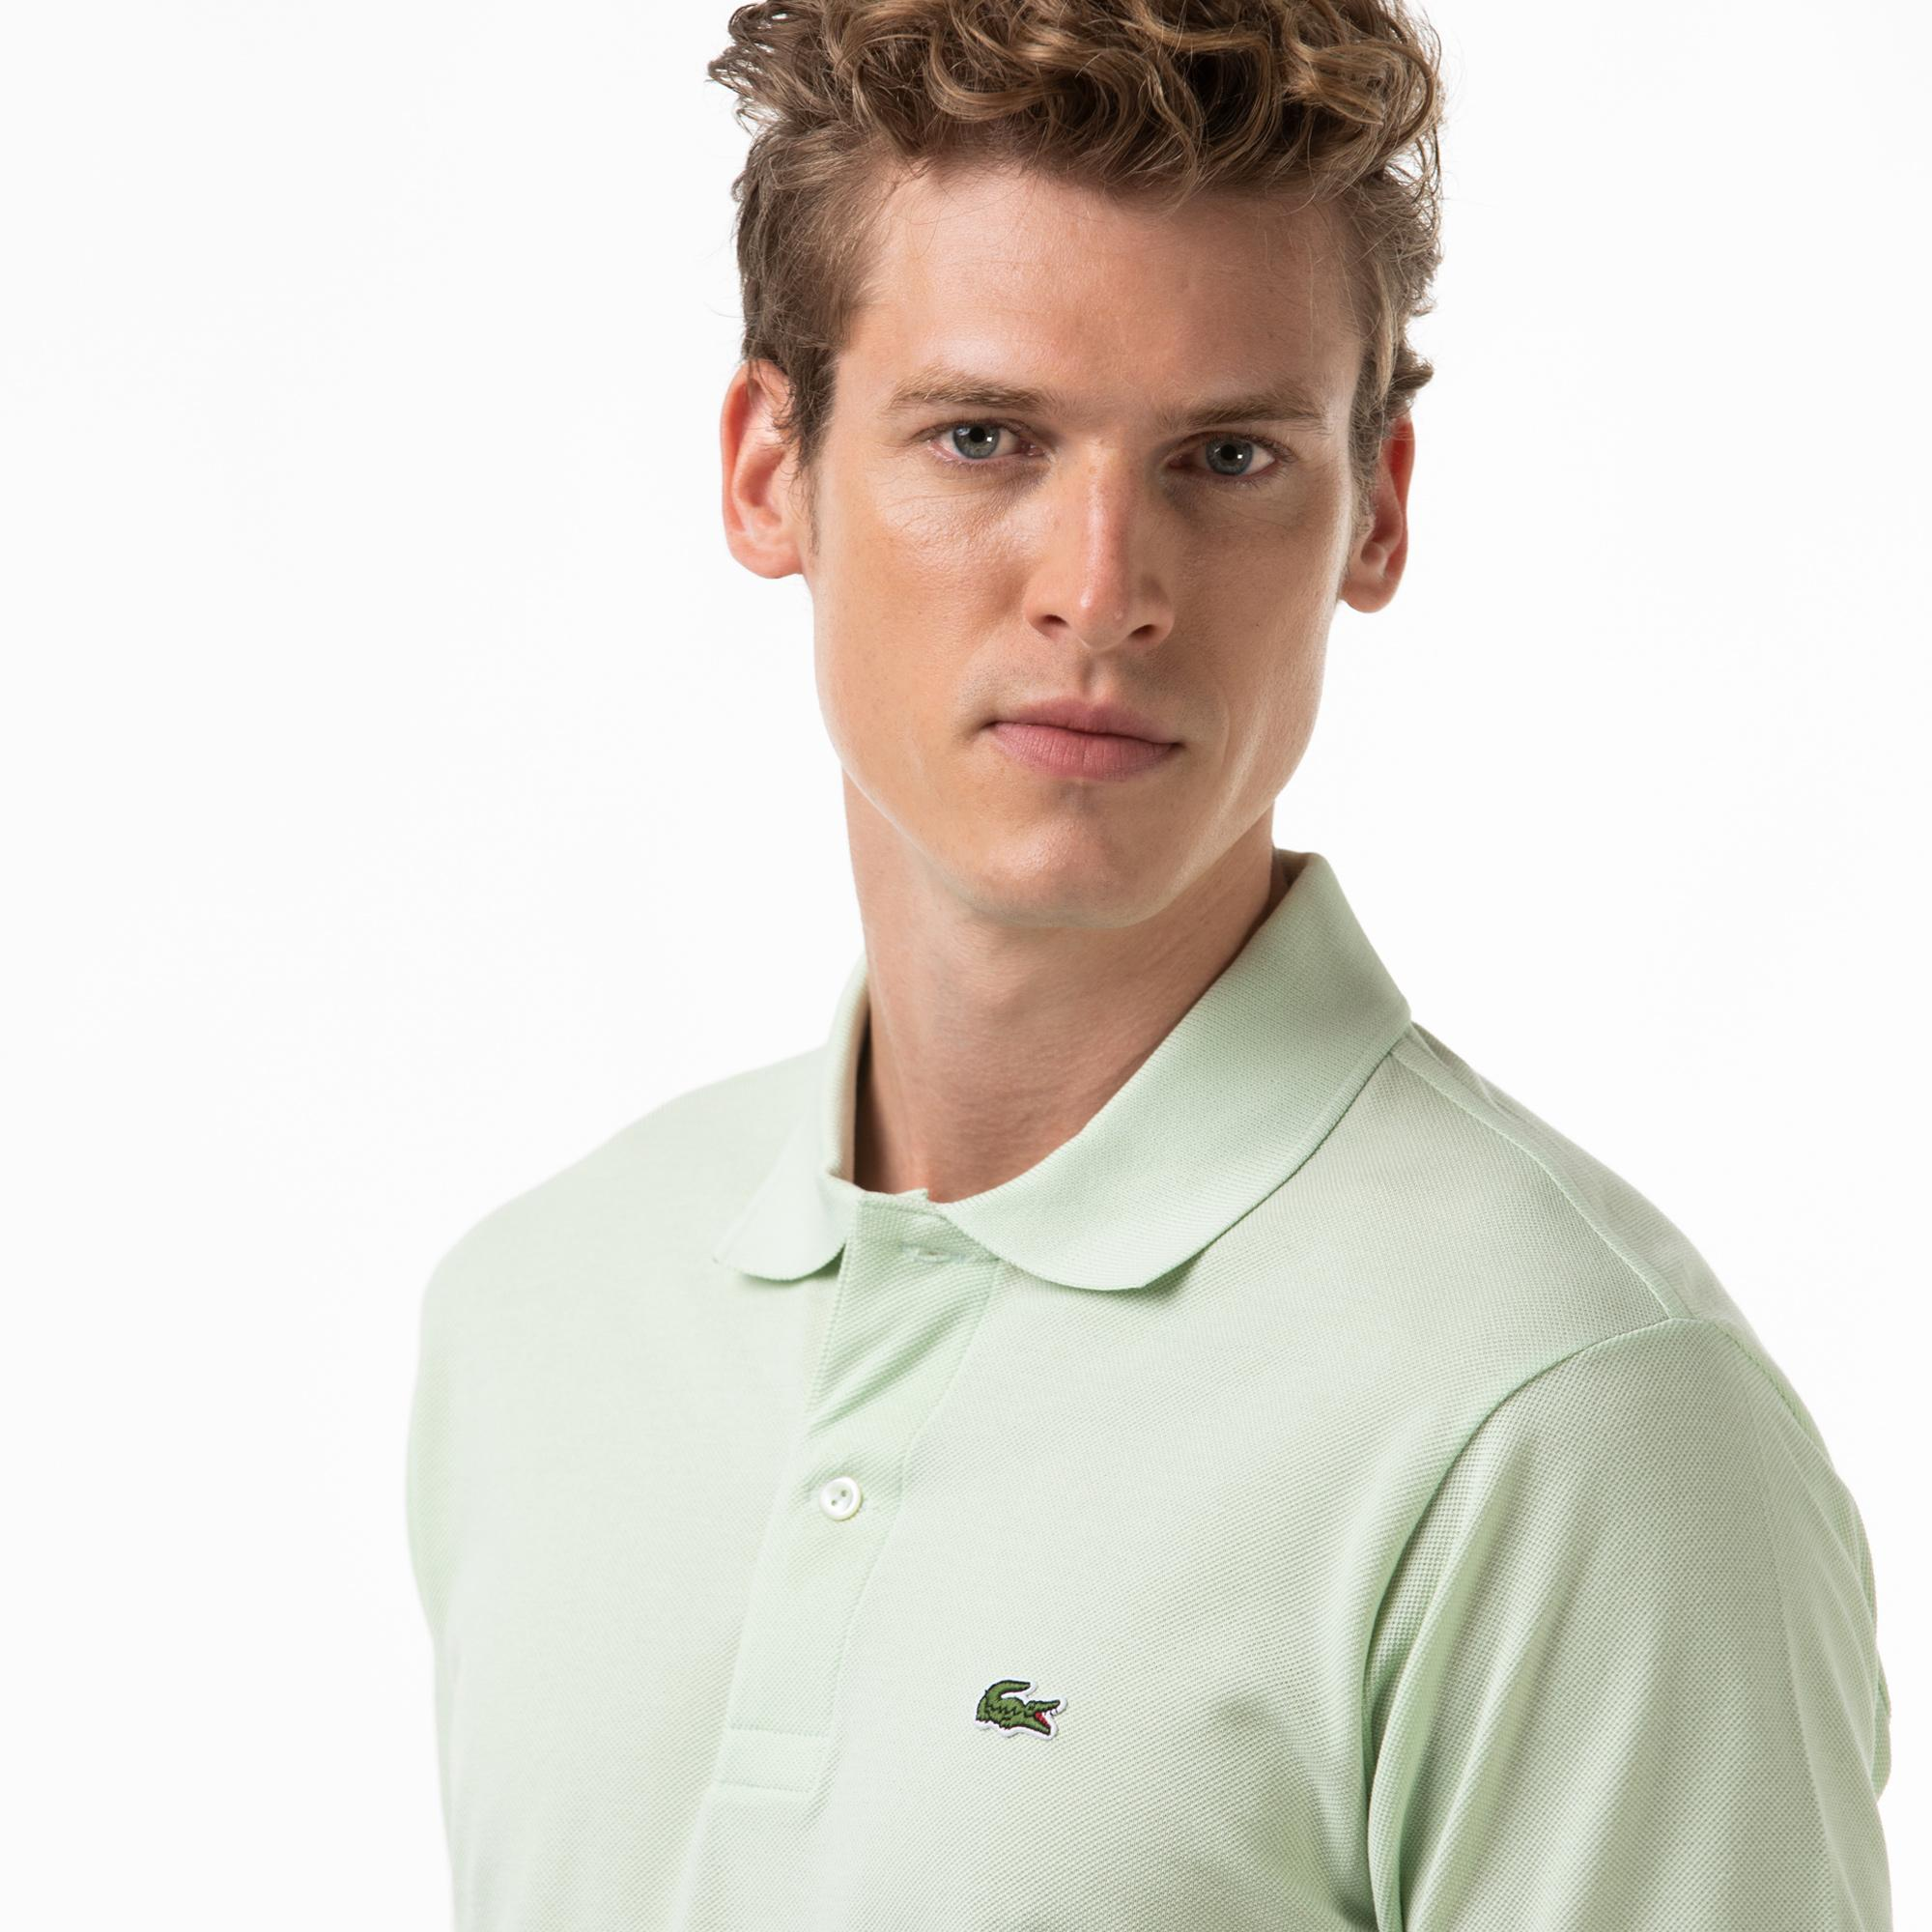 Lacoste Erkek Klasik Fit Açık Yeşil L1212 Polo